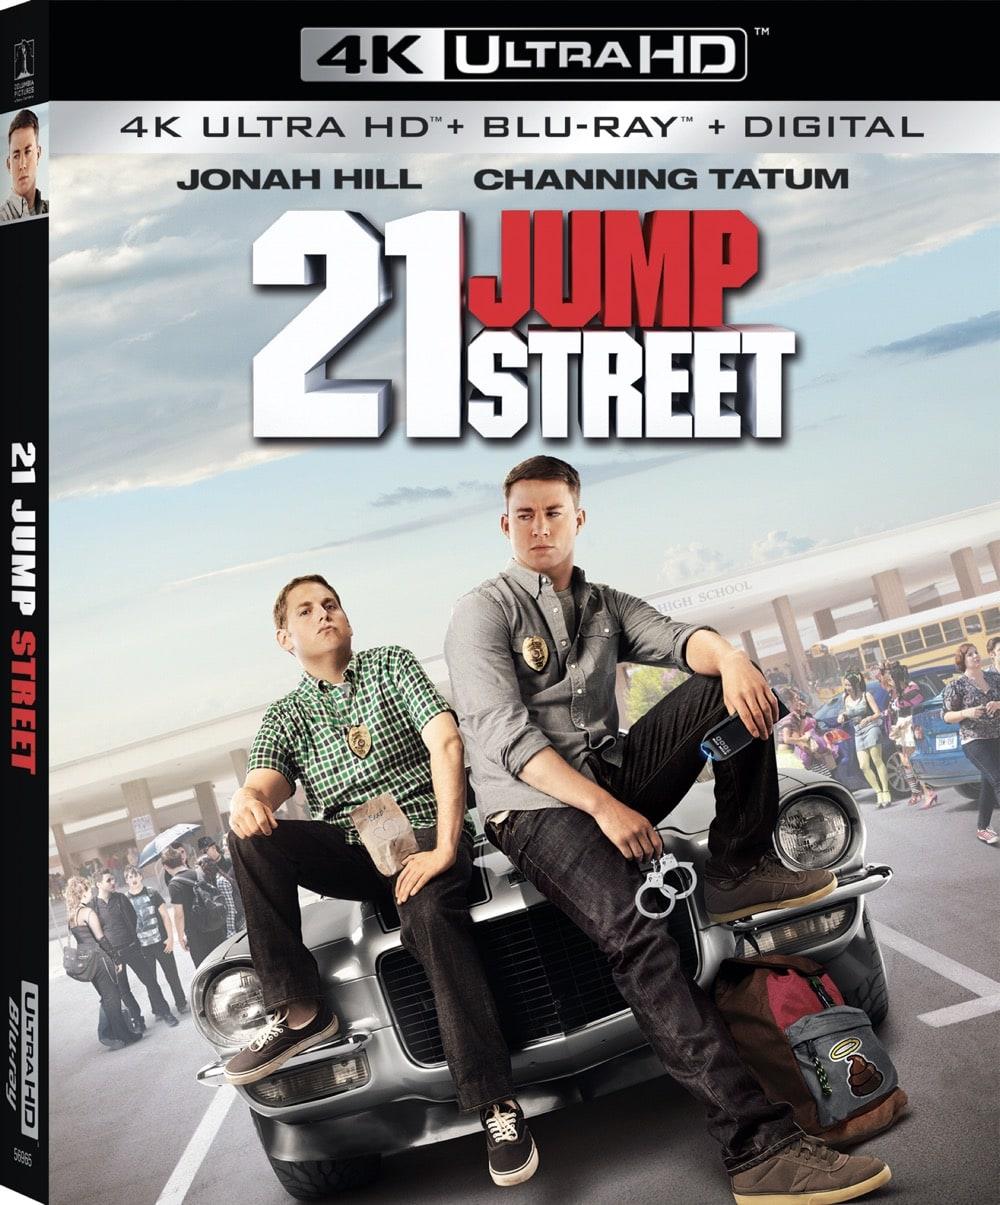 21Jumpstreet UHD ORING PACKSHOT